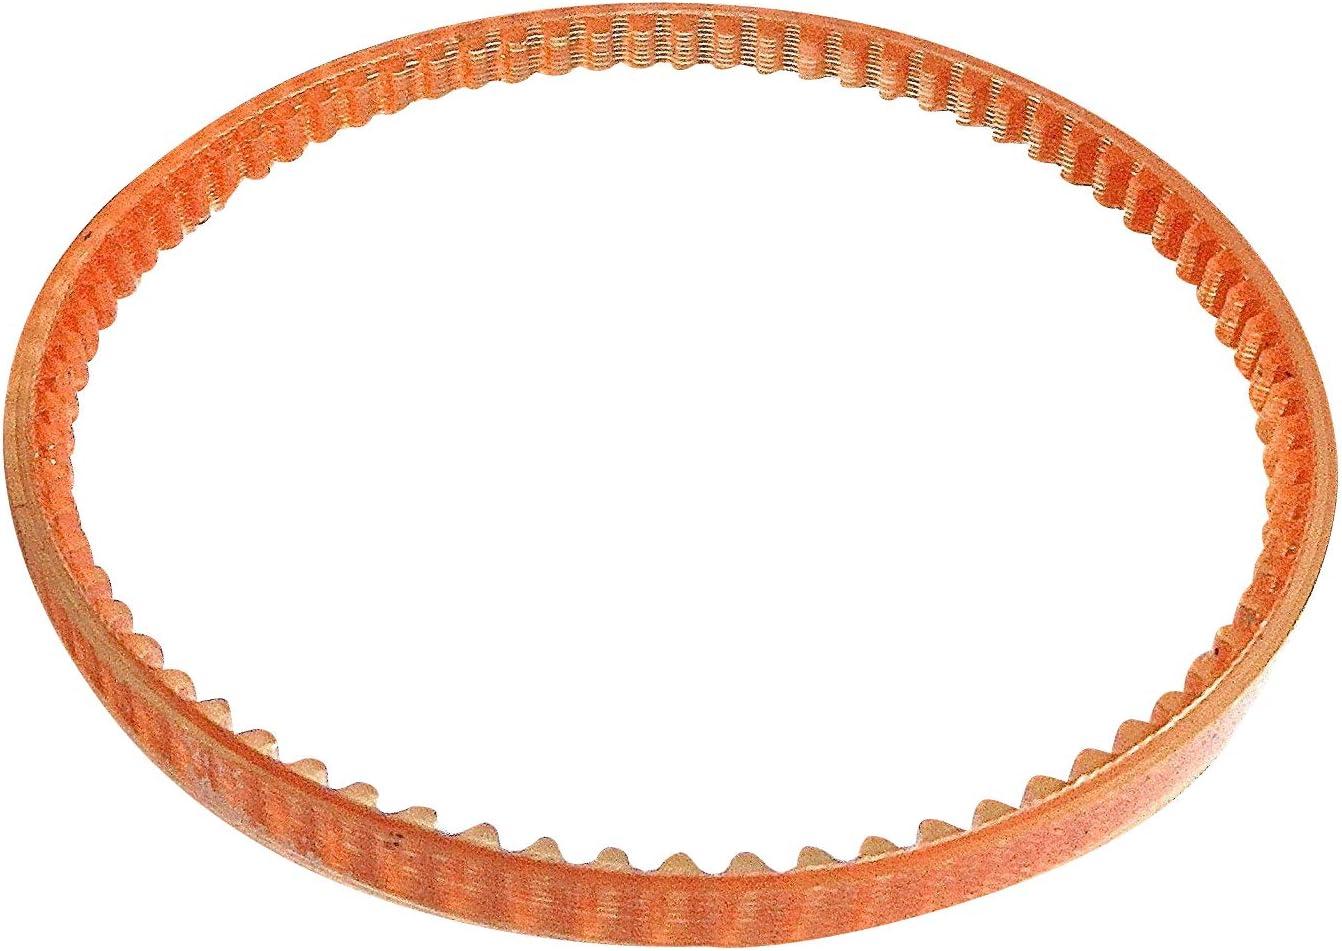 ZickZackNaehmaschine Correa trapezoidal para correa dentada para máquina de coser (Motor) Cultivo Motor Mochila Motor 350